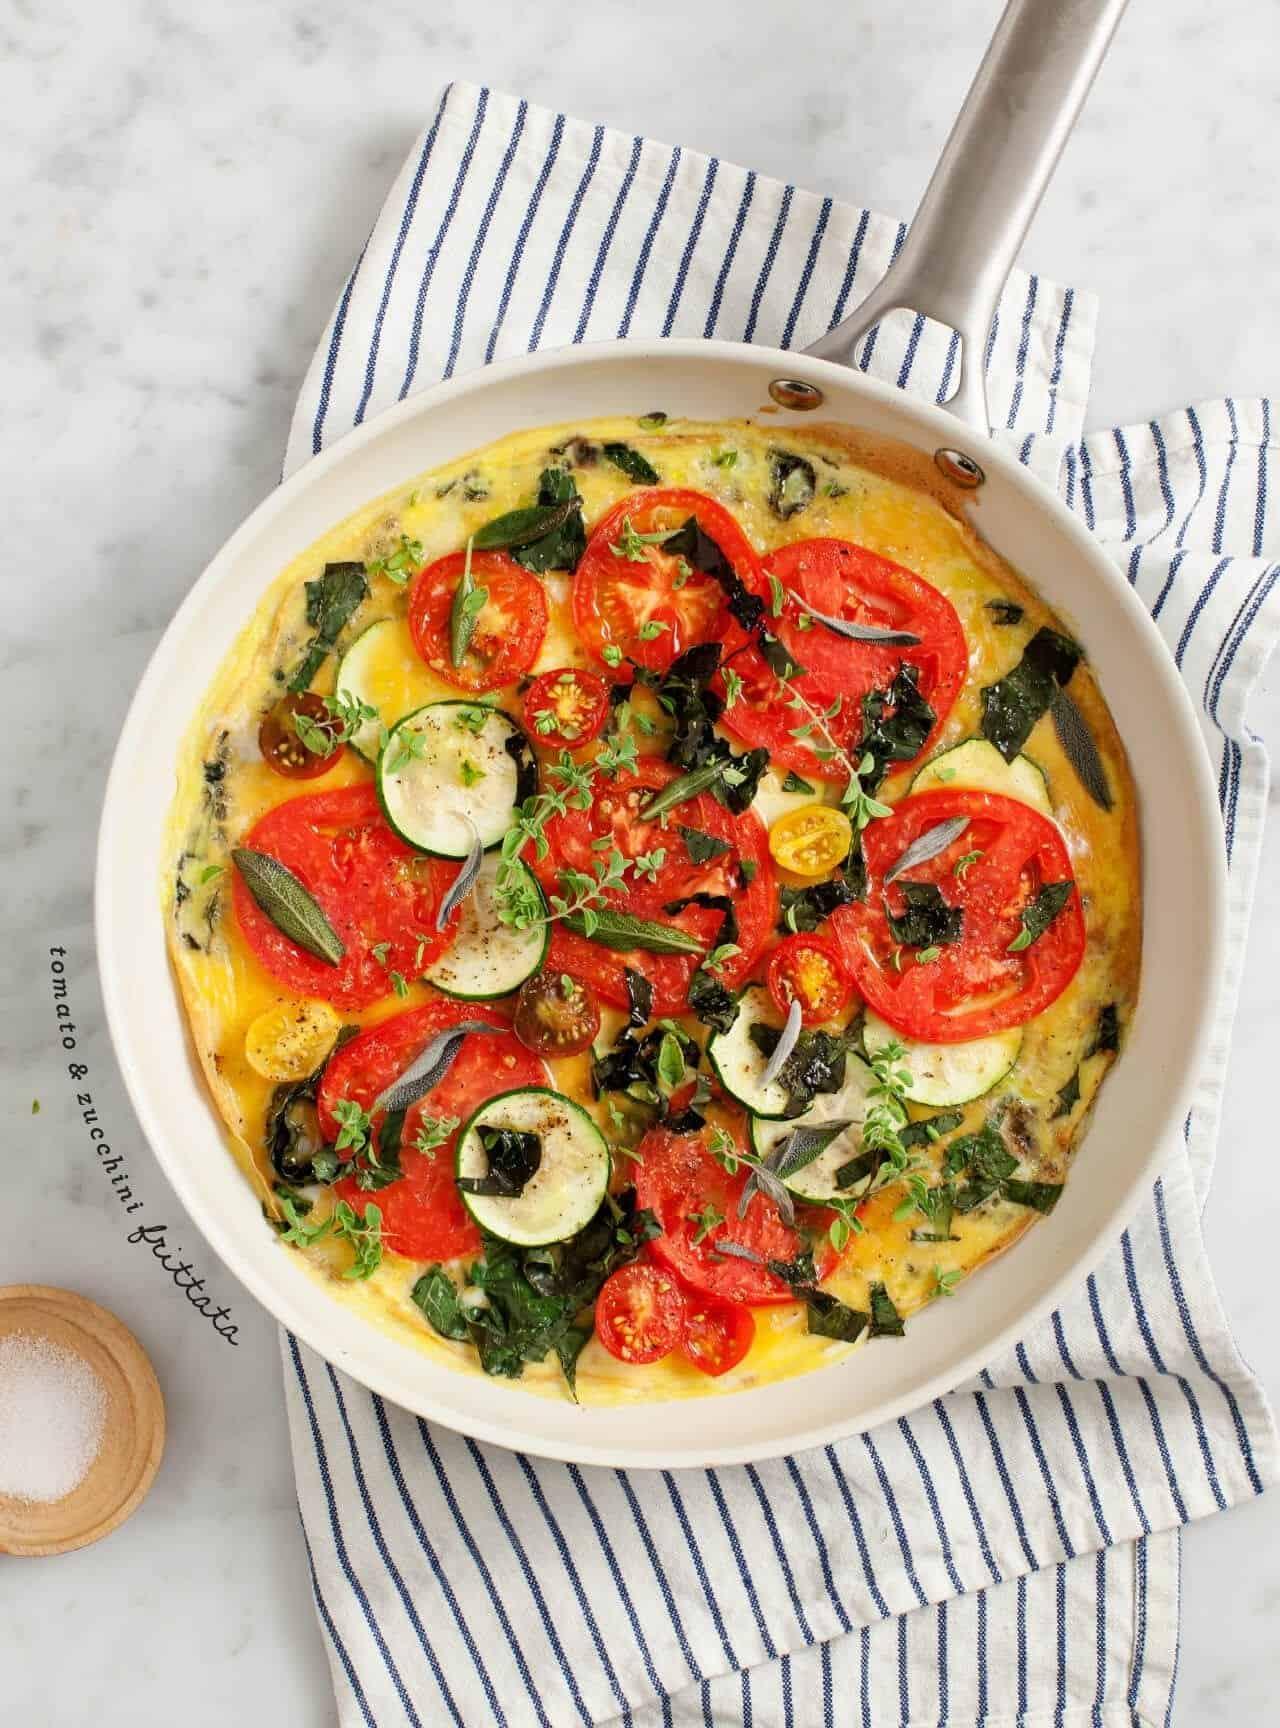 tomato and zucchini frittata